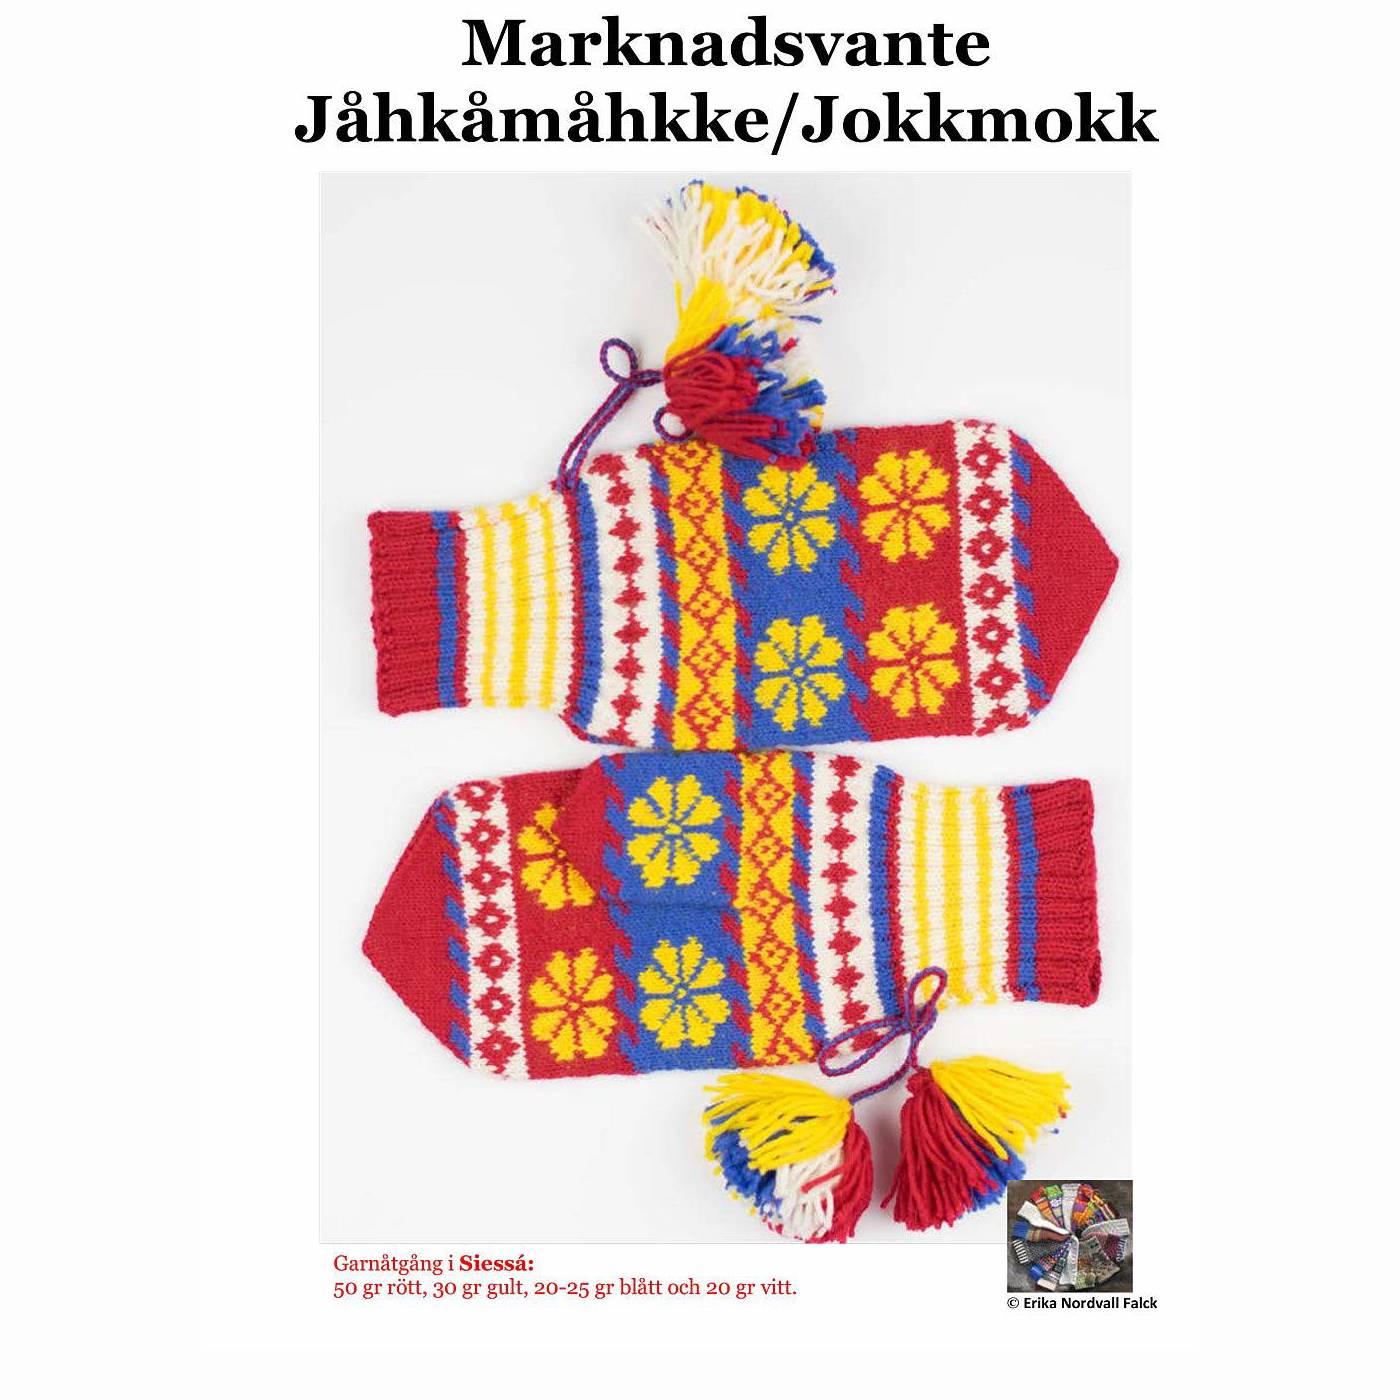 Marknadsvante Jåhkåmåhkke, Stoorstålka